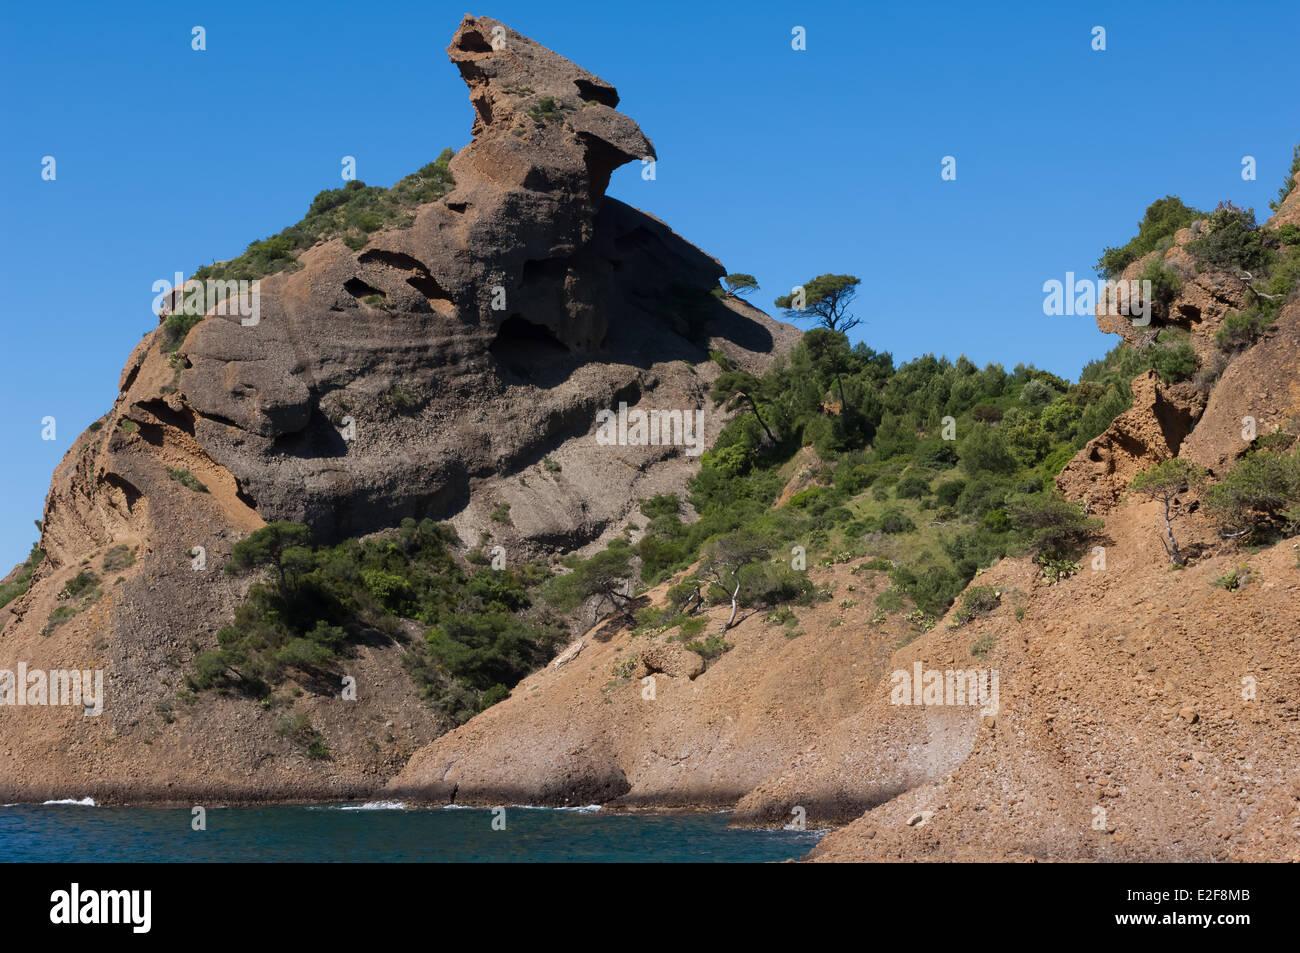 France, Bouches du Rhone, La Ciotat, the Figuerolles calanque, the Capucin rock formation - Stock Image